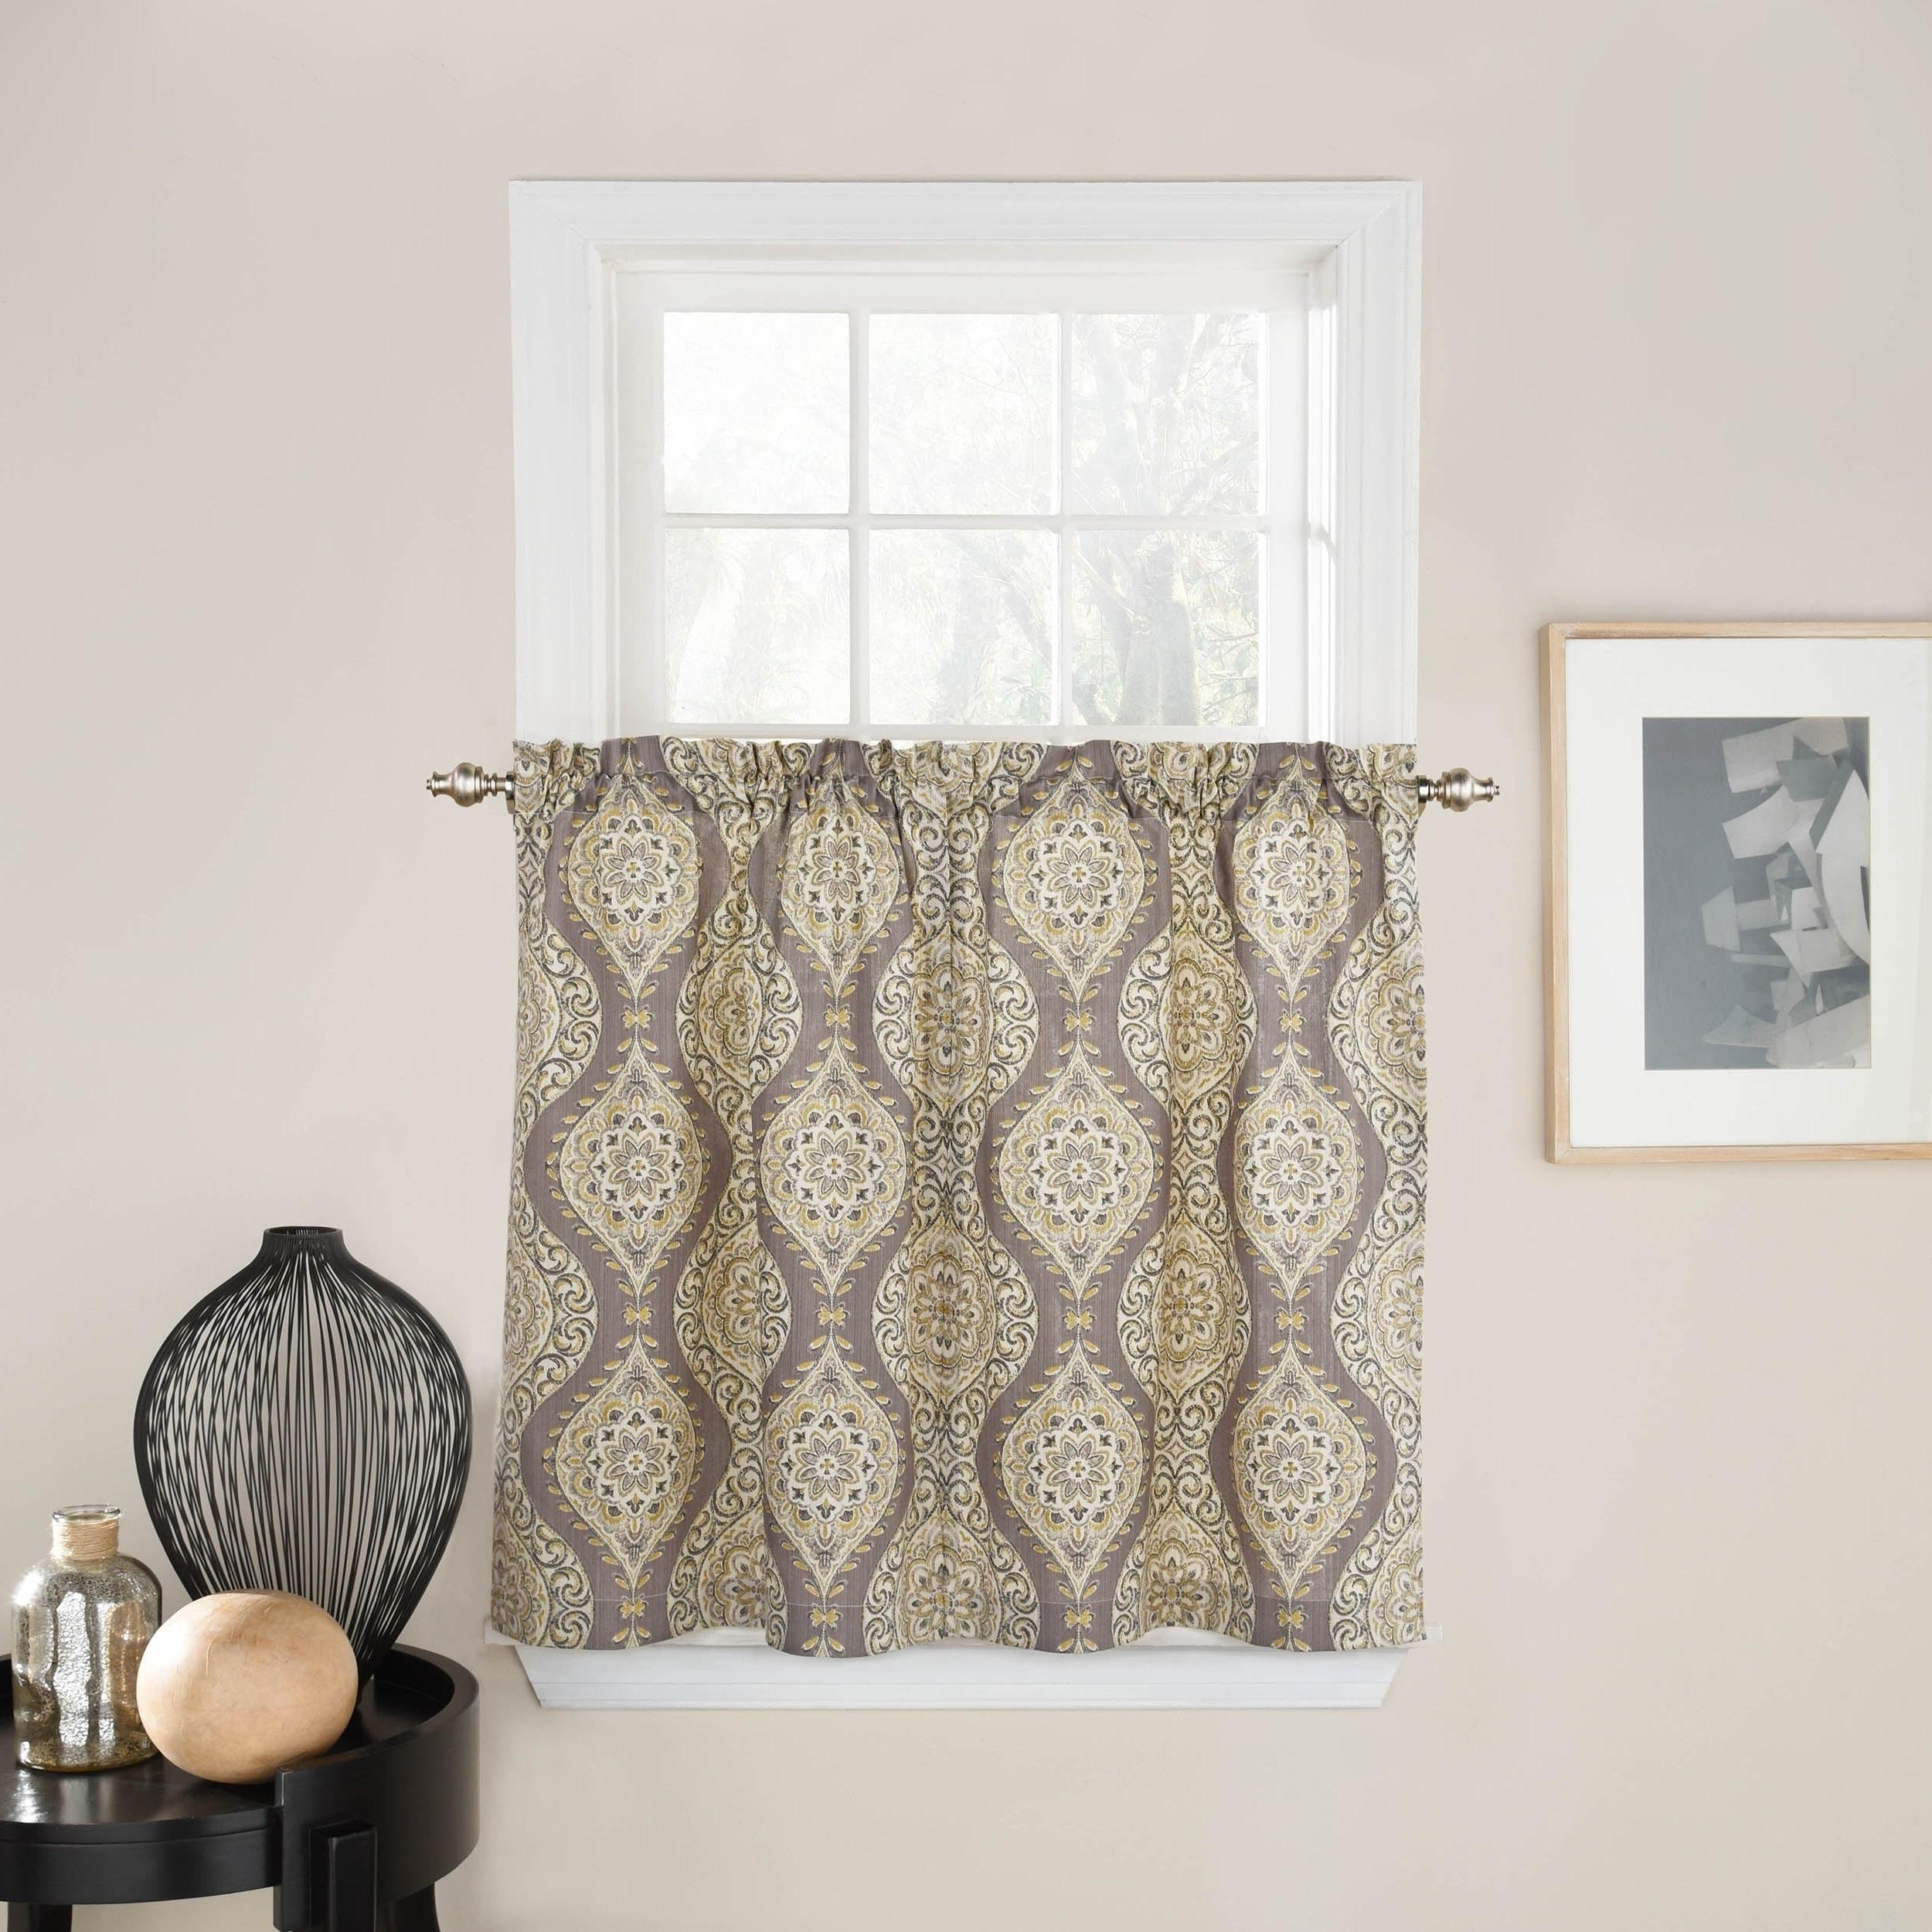 Waverly Moonlight Medallion Window Curtain Tier Pair Regarding 2020 Medallion Window Curtain Valances (View 8 of 20)